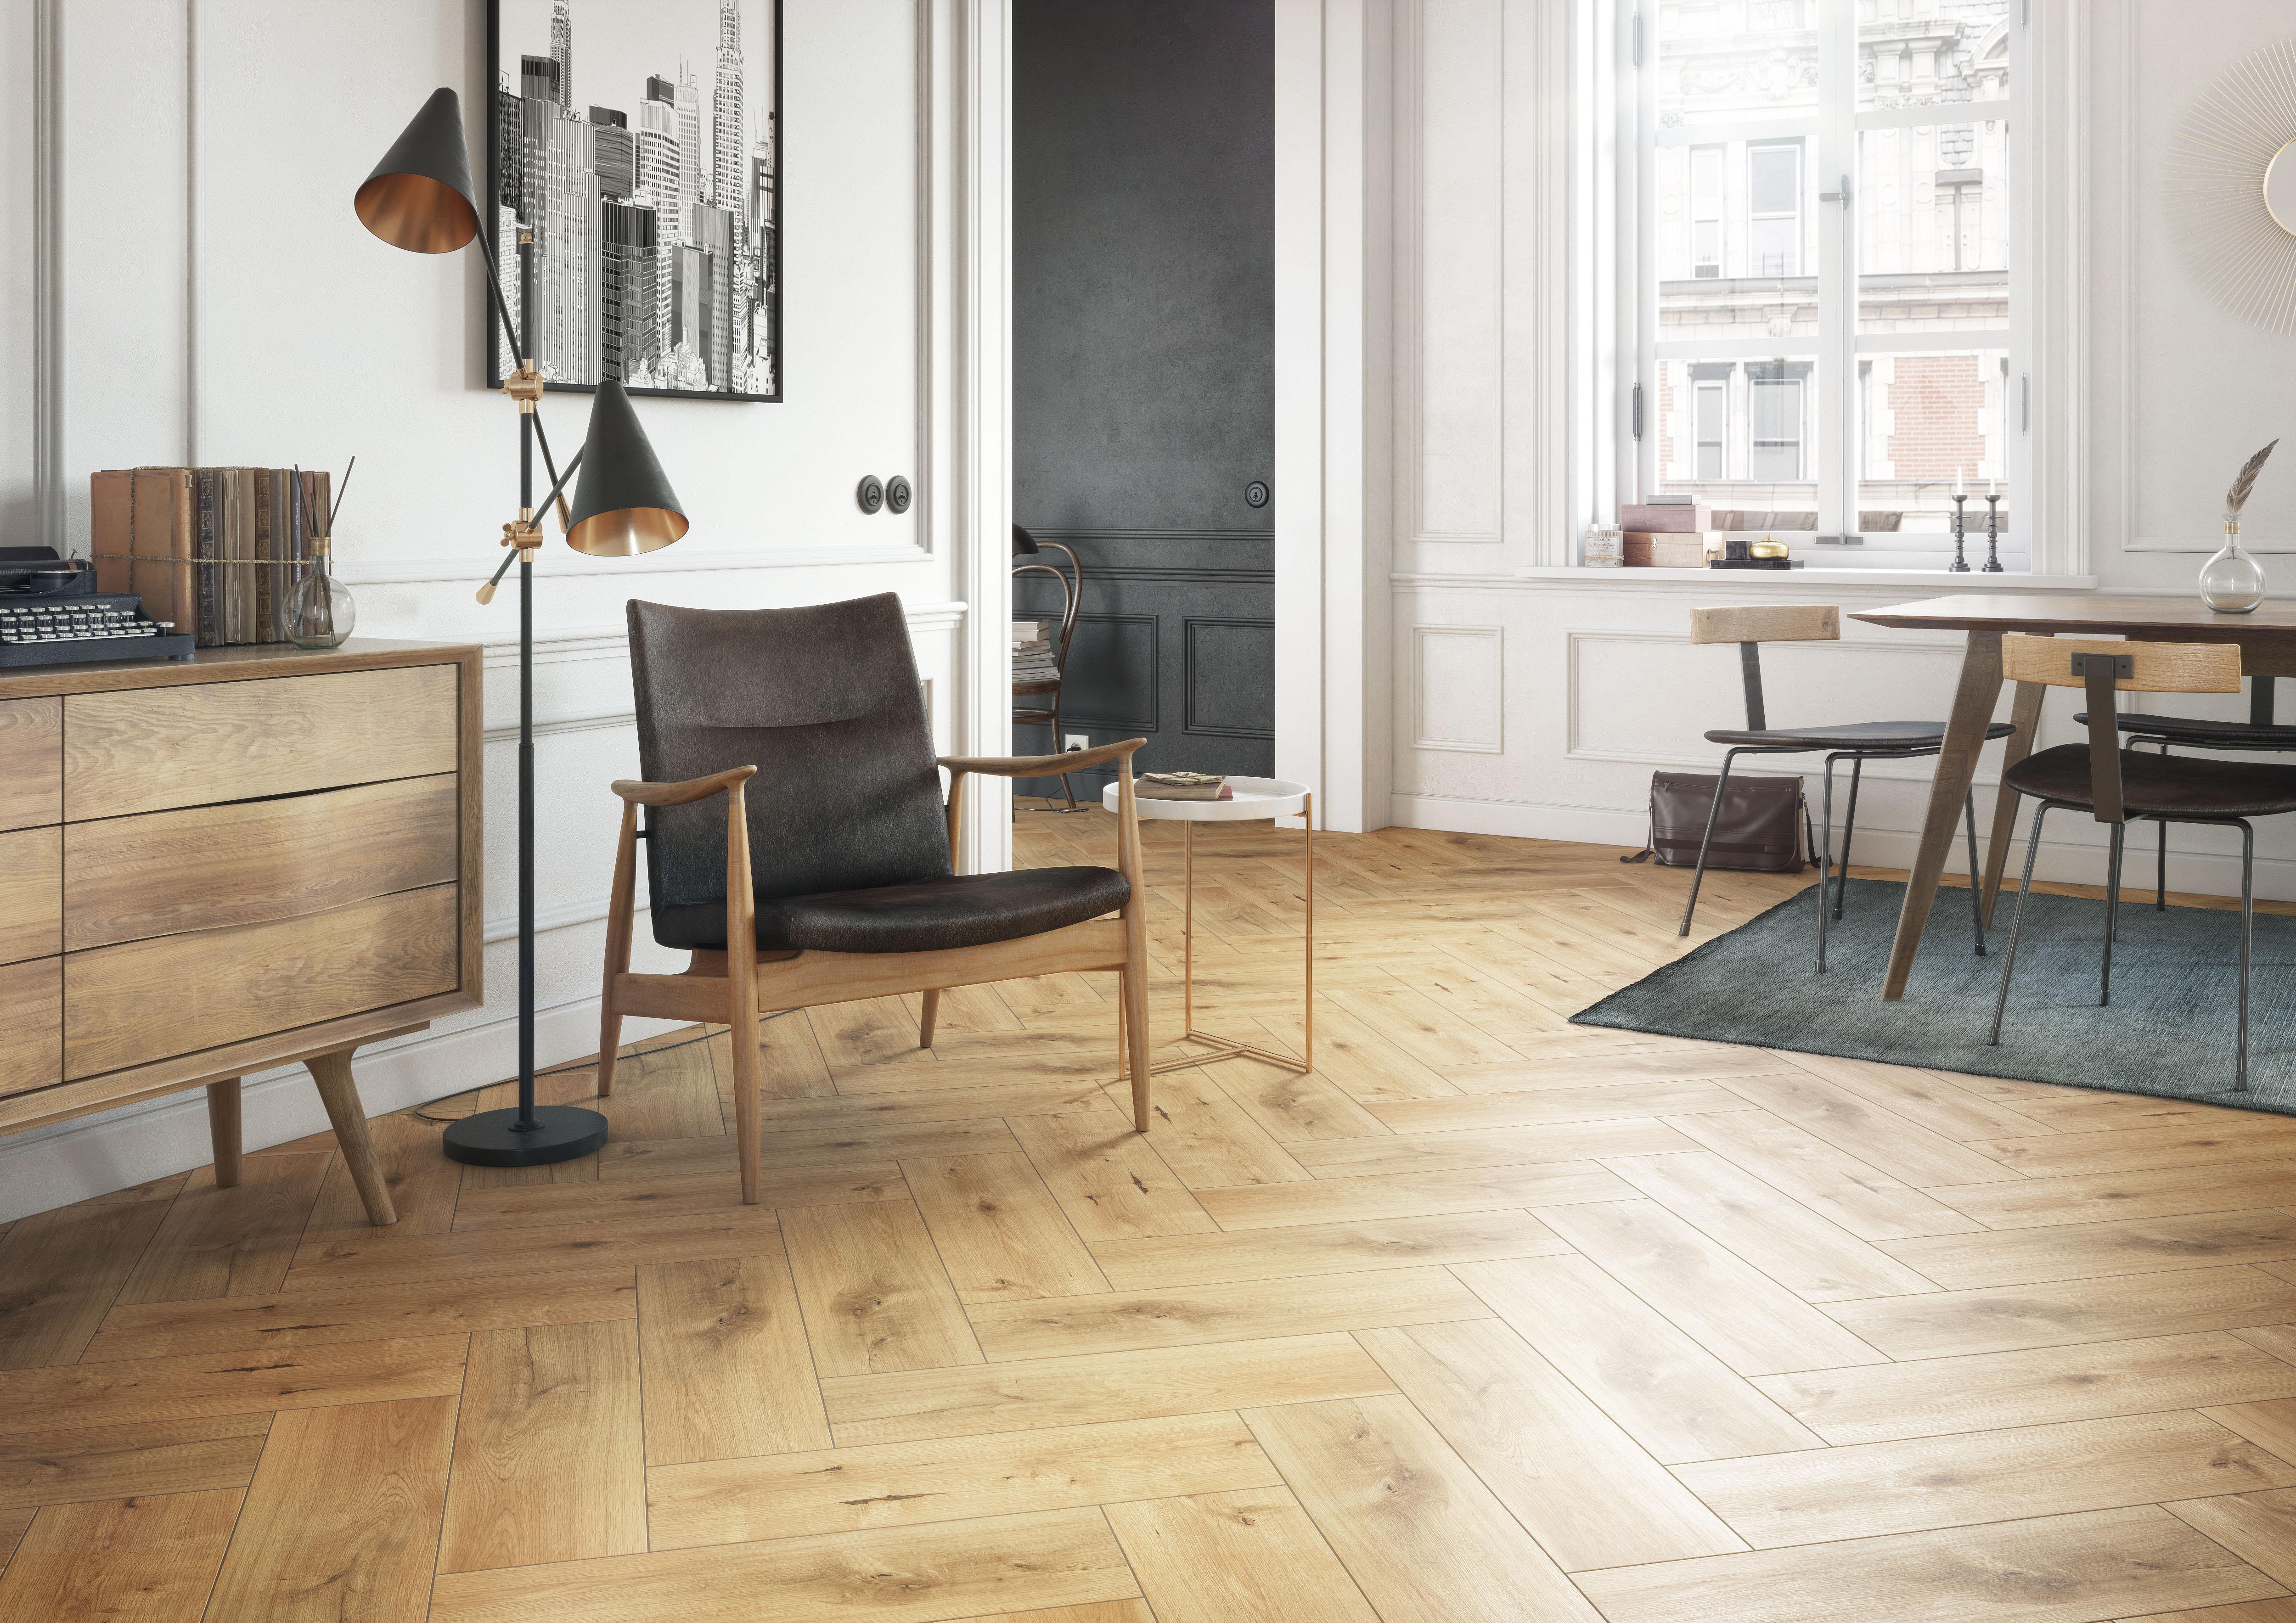 ru_sandwood_modernism_livingroom_1_mpl